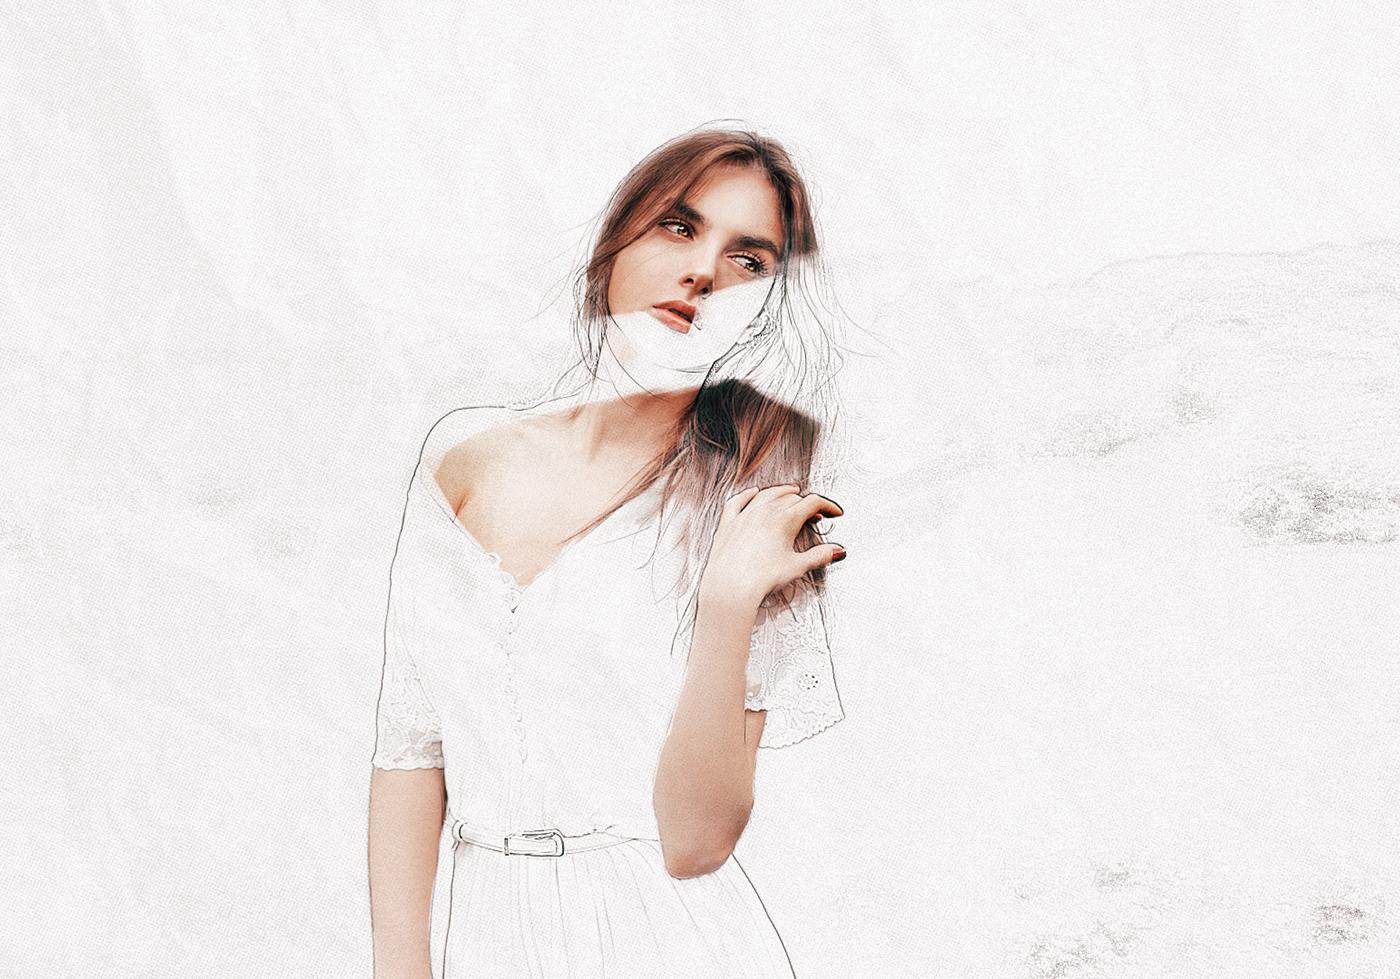 beauty,drawn,paper,edit,woman,model,lines,draw